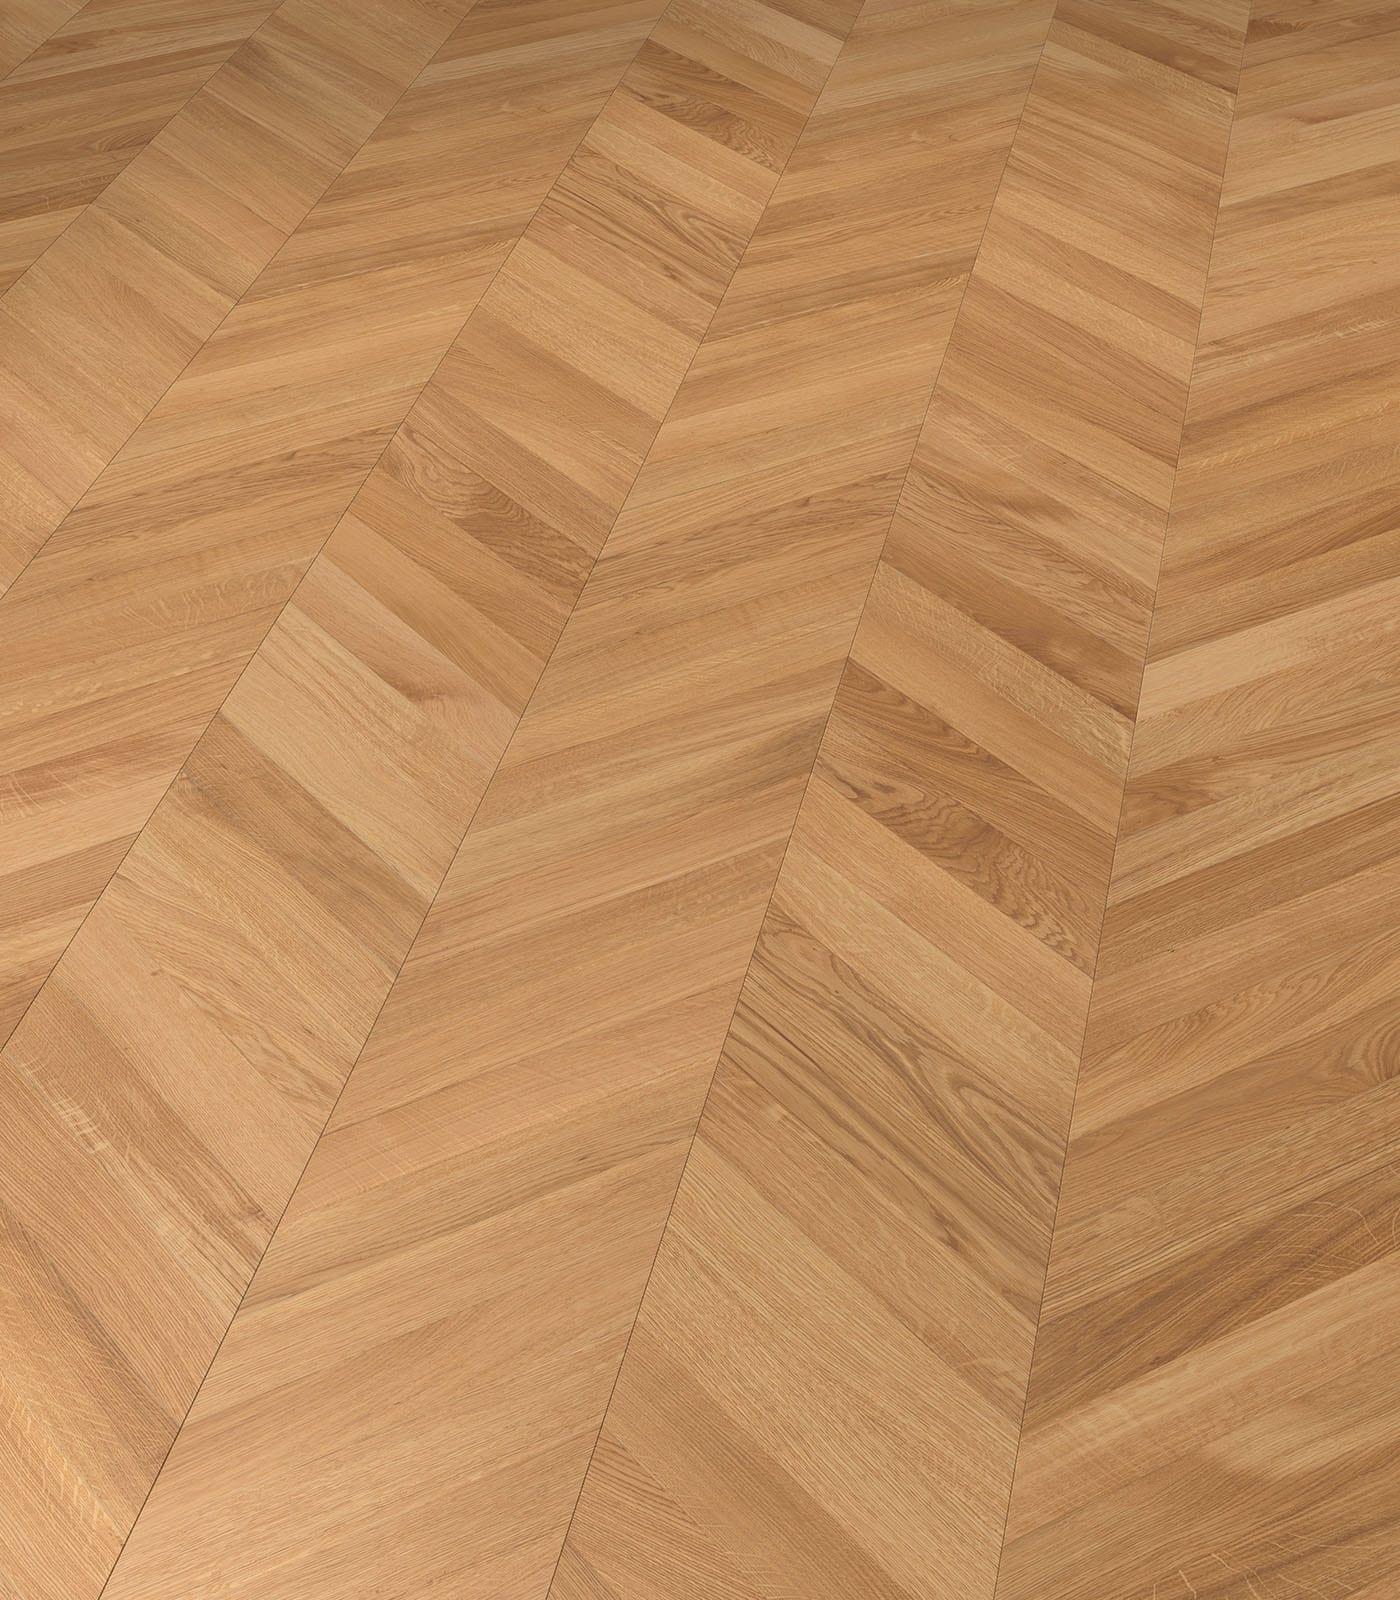 European Oak Chevron Connex floors-Fashion Collection-angle